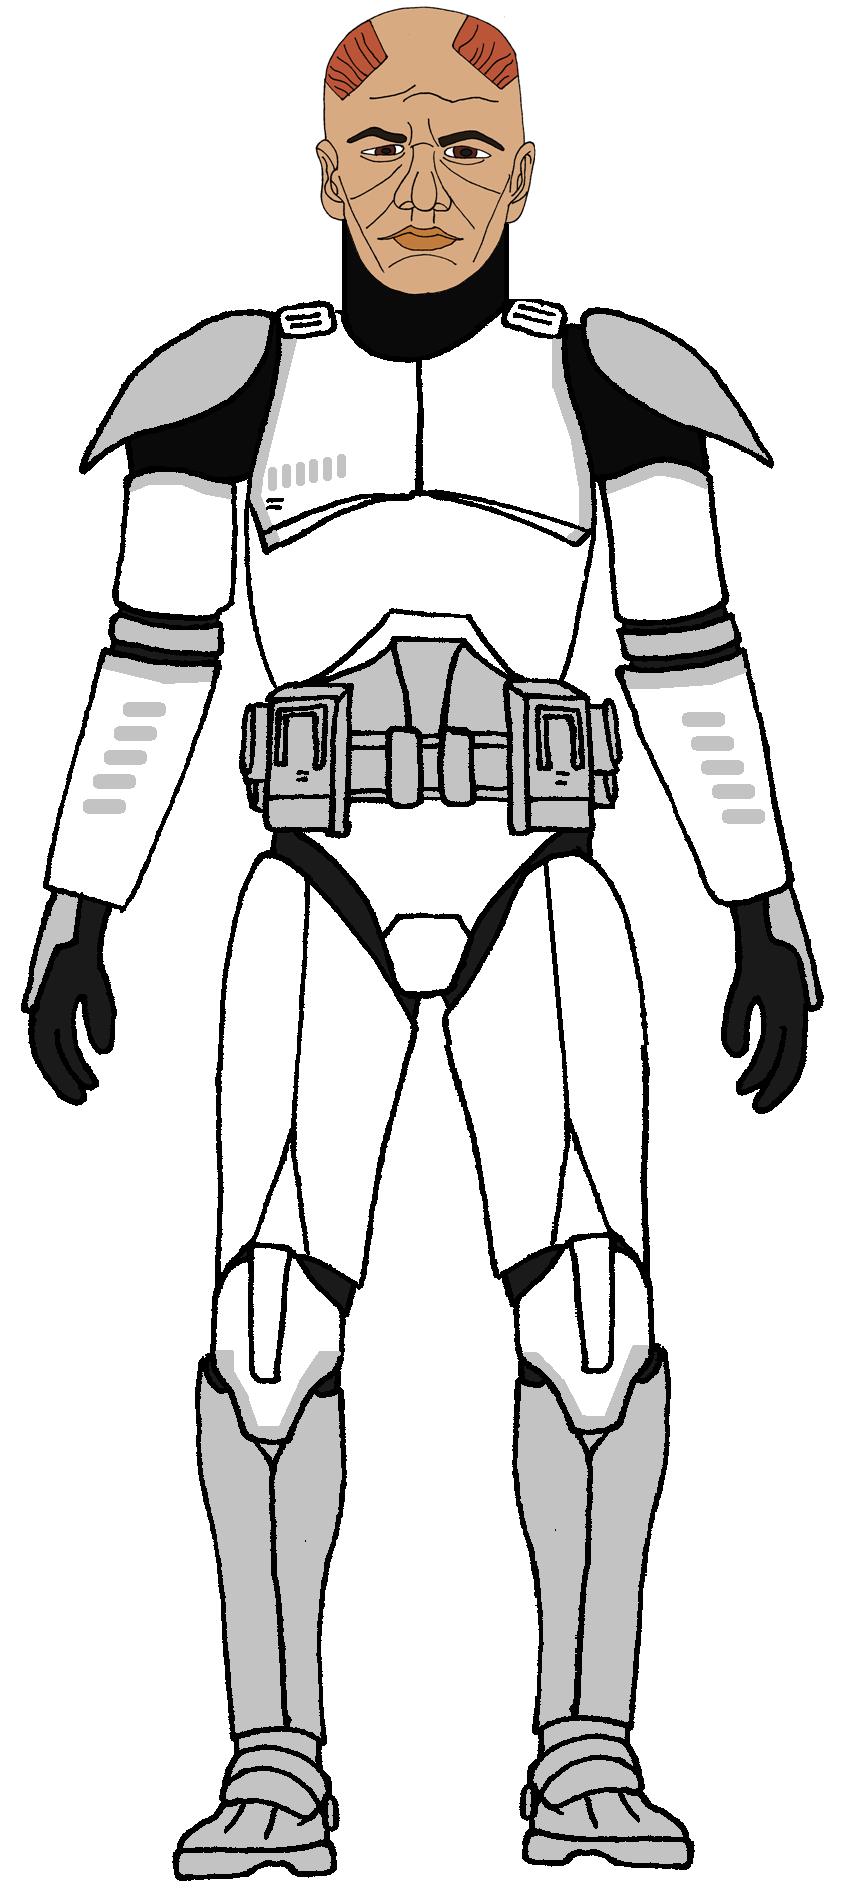 Clone Trooper Commander Gree 4 Star Wars Clone Wars Star Wars Pictures Star Wars Trooper